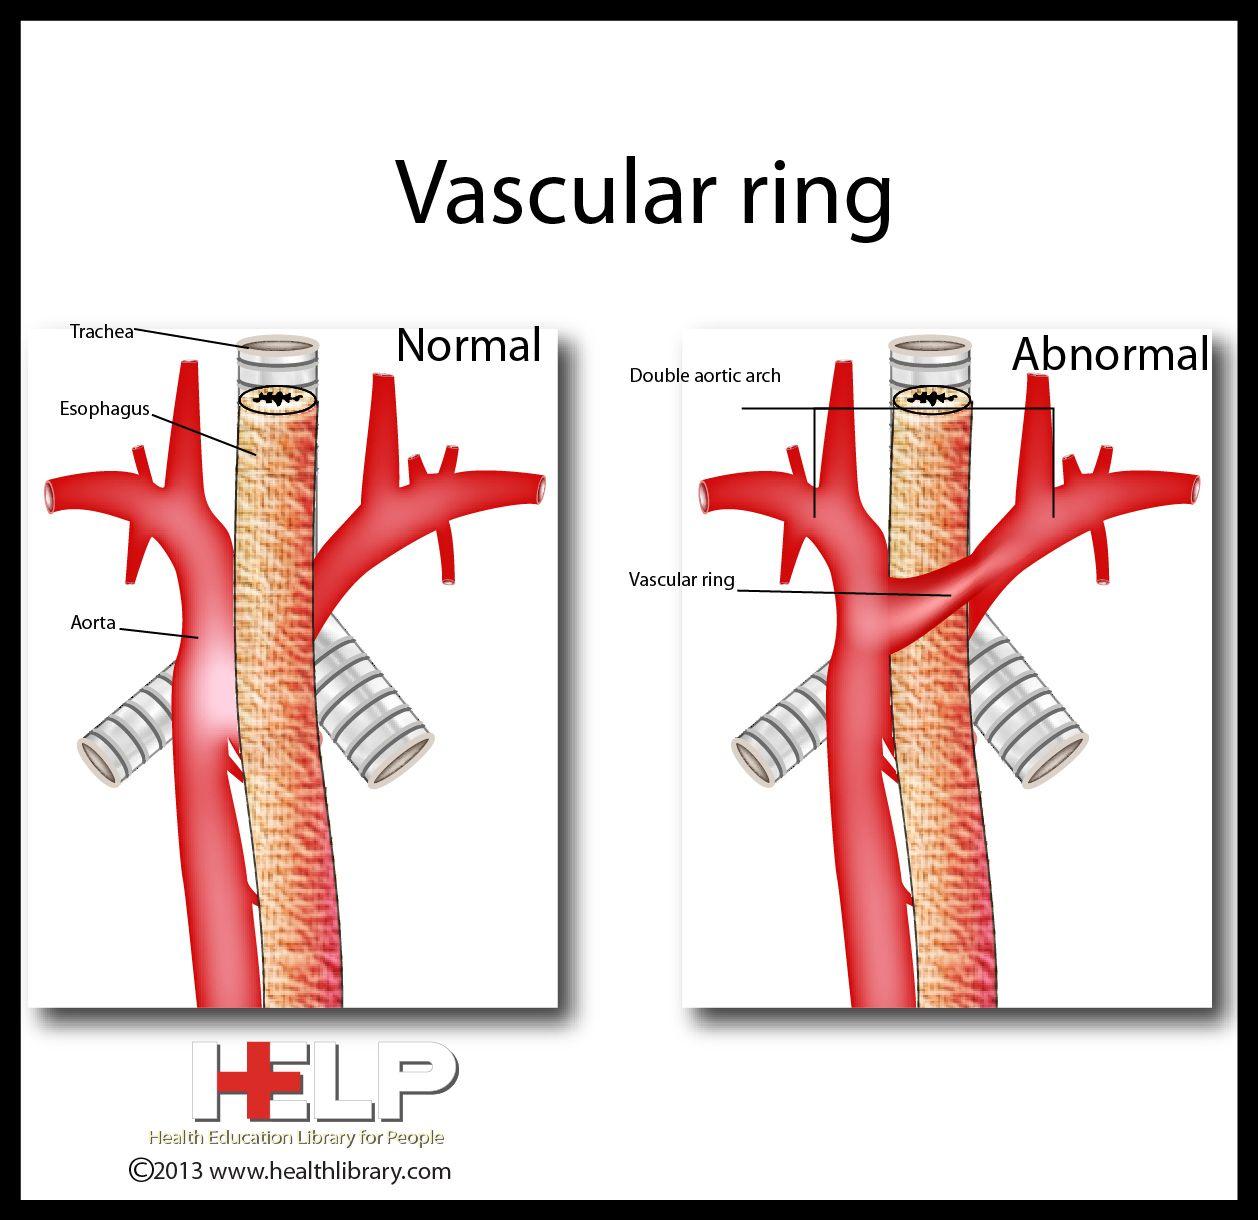 Division Of Vascular Ring